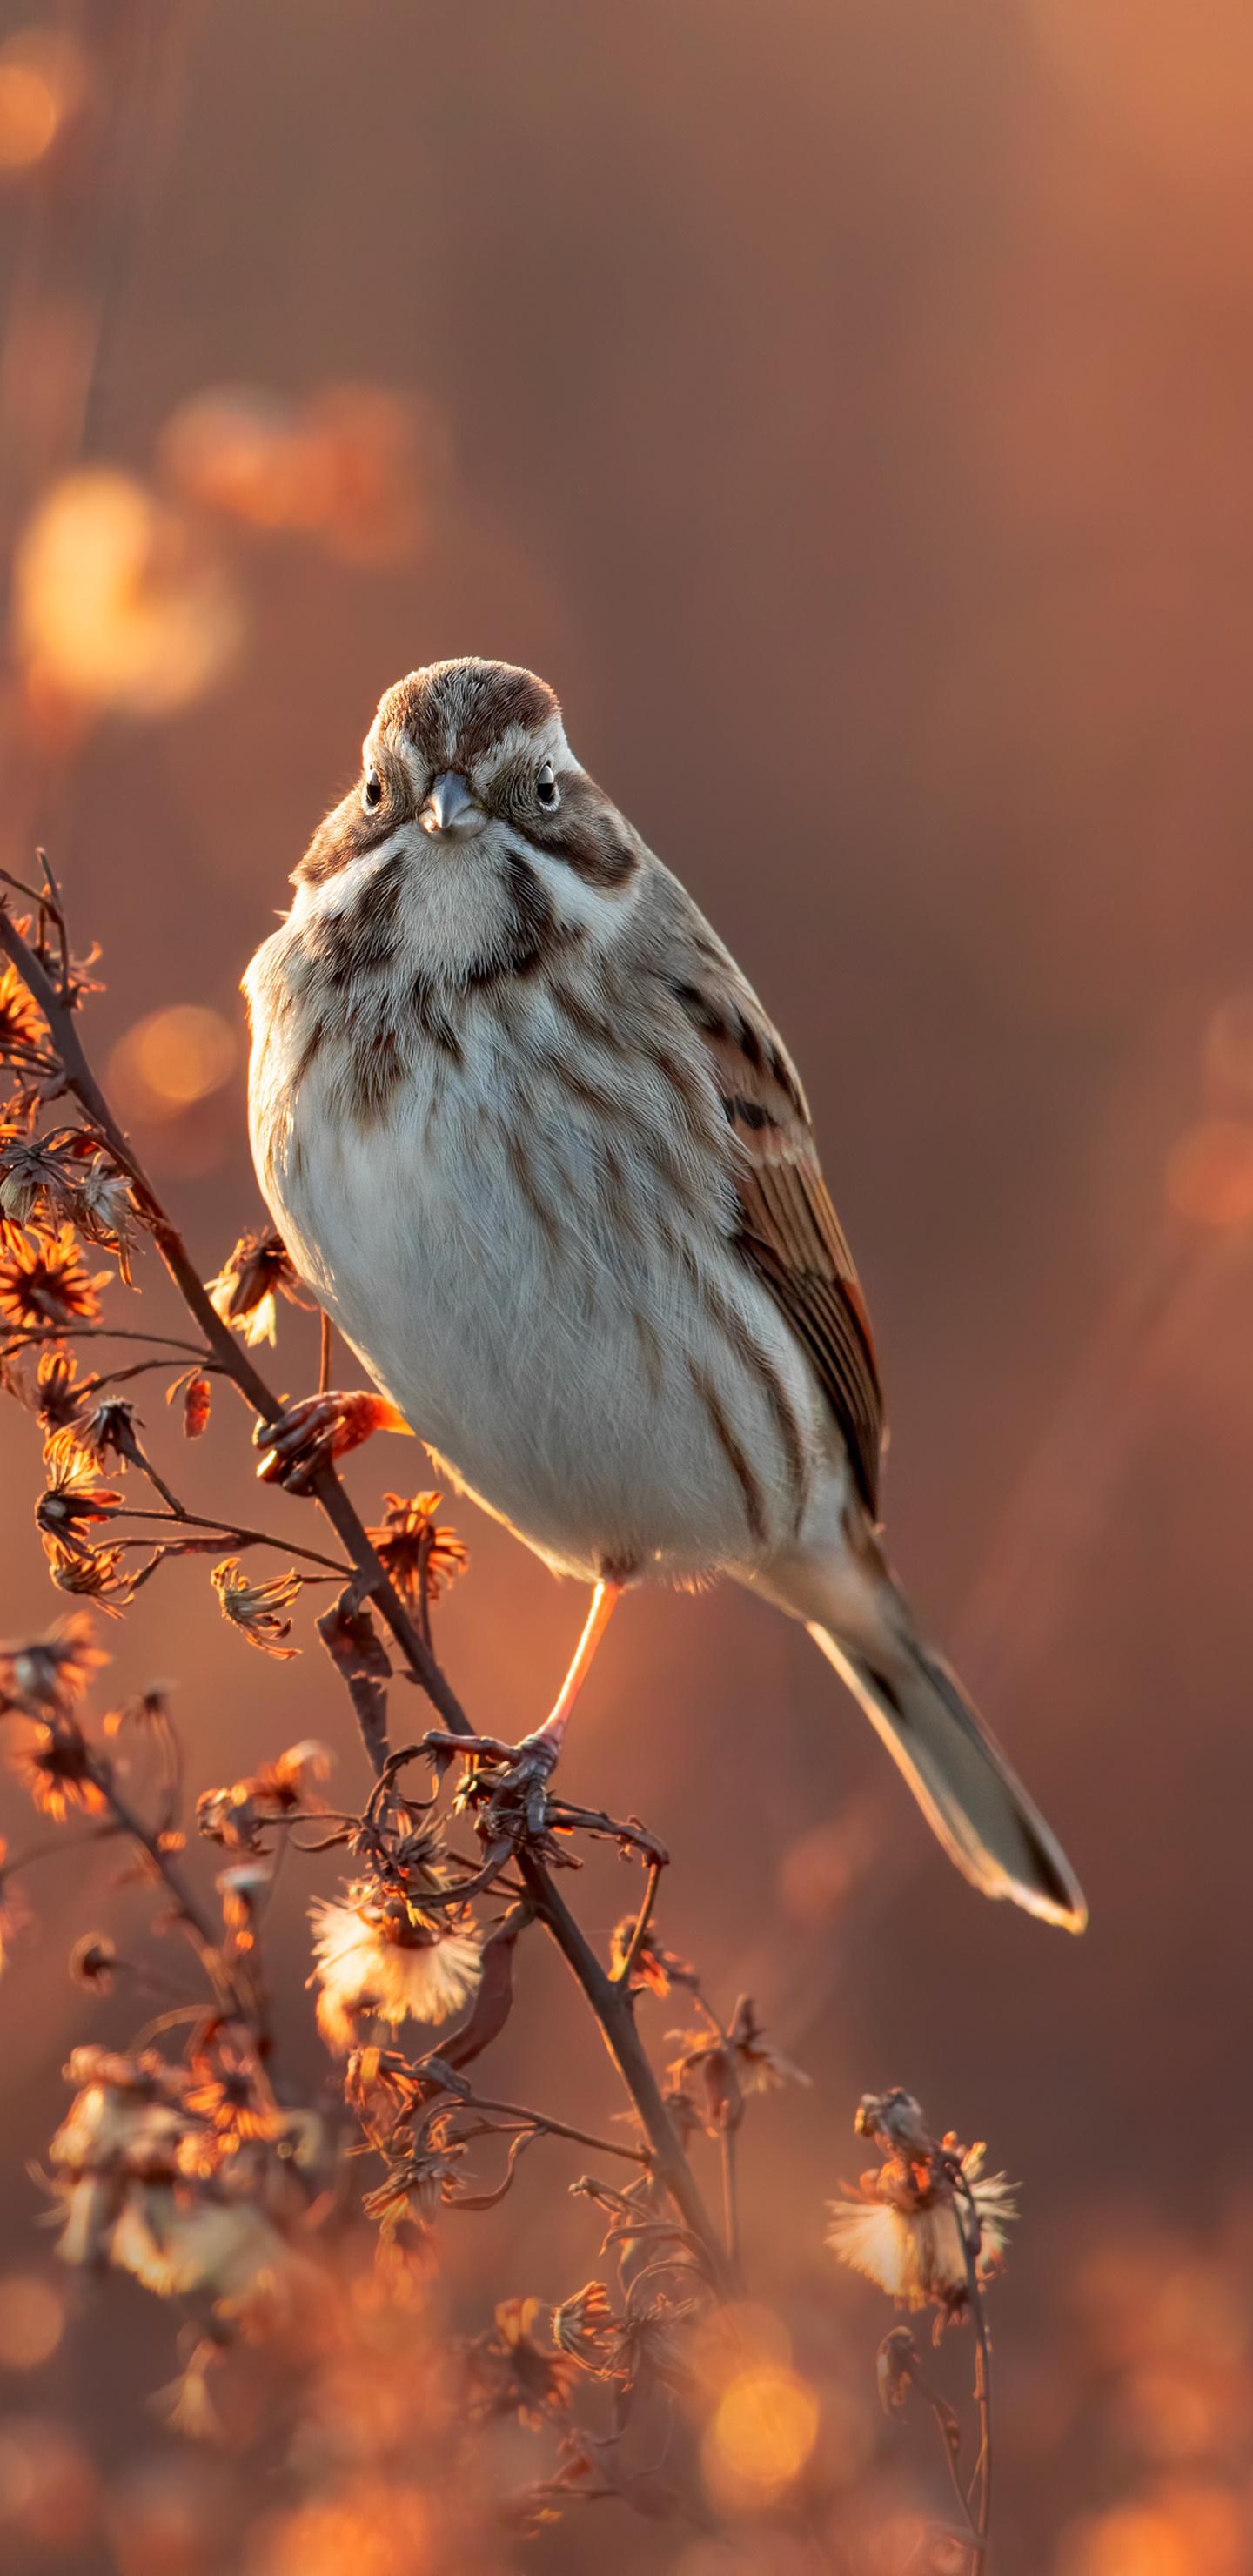 bird-sitting-on-branch-8a.jpg